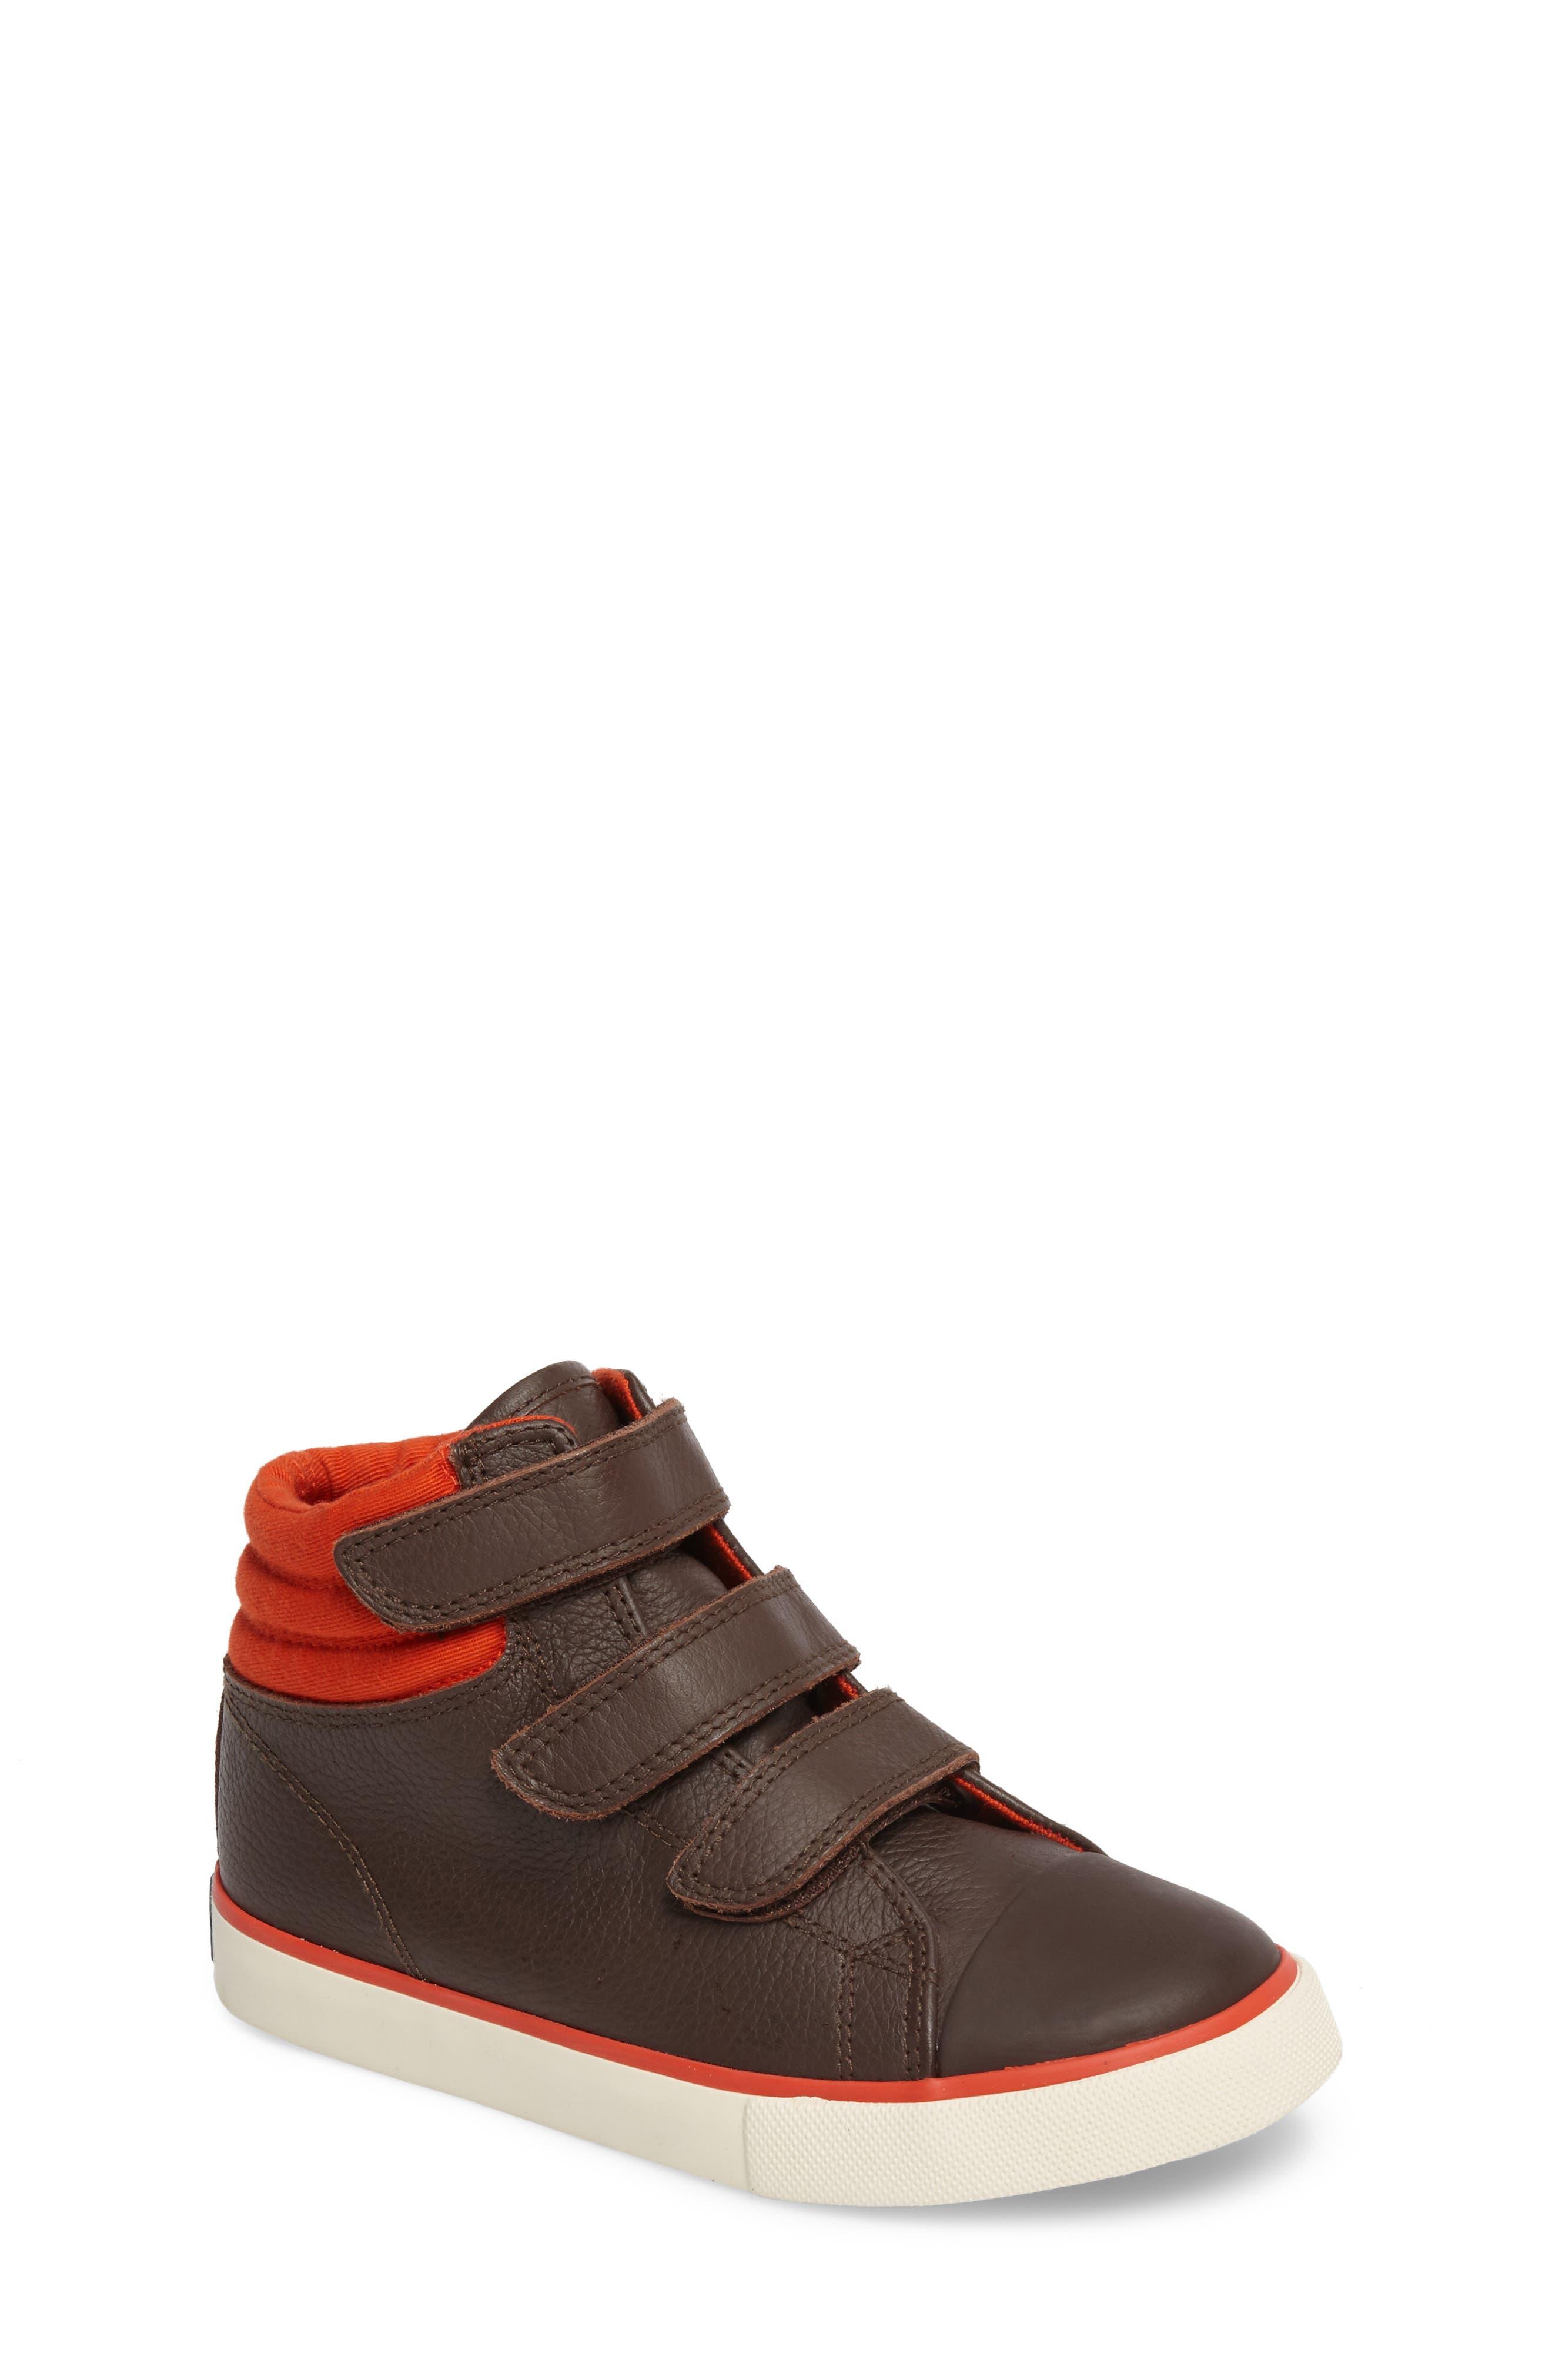 Mini Boden High Top Sneaker (Toddler, Little Kid & Big Kid)